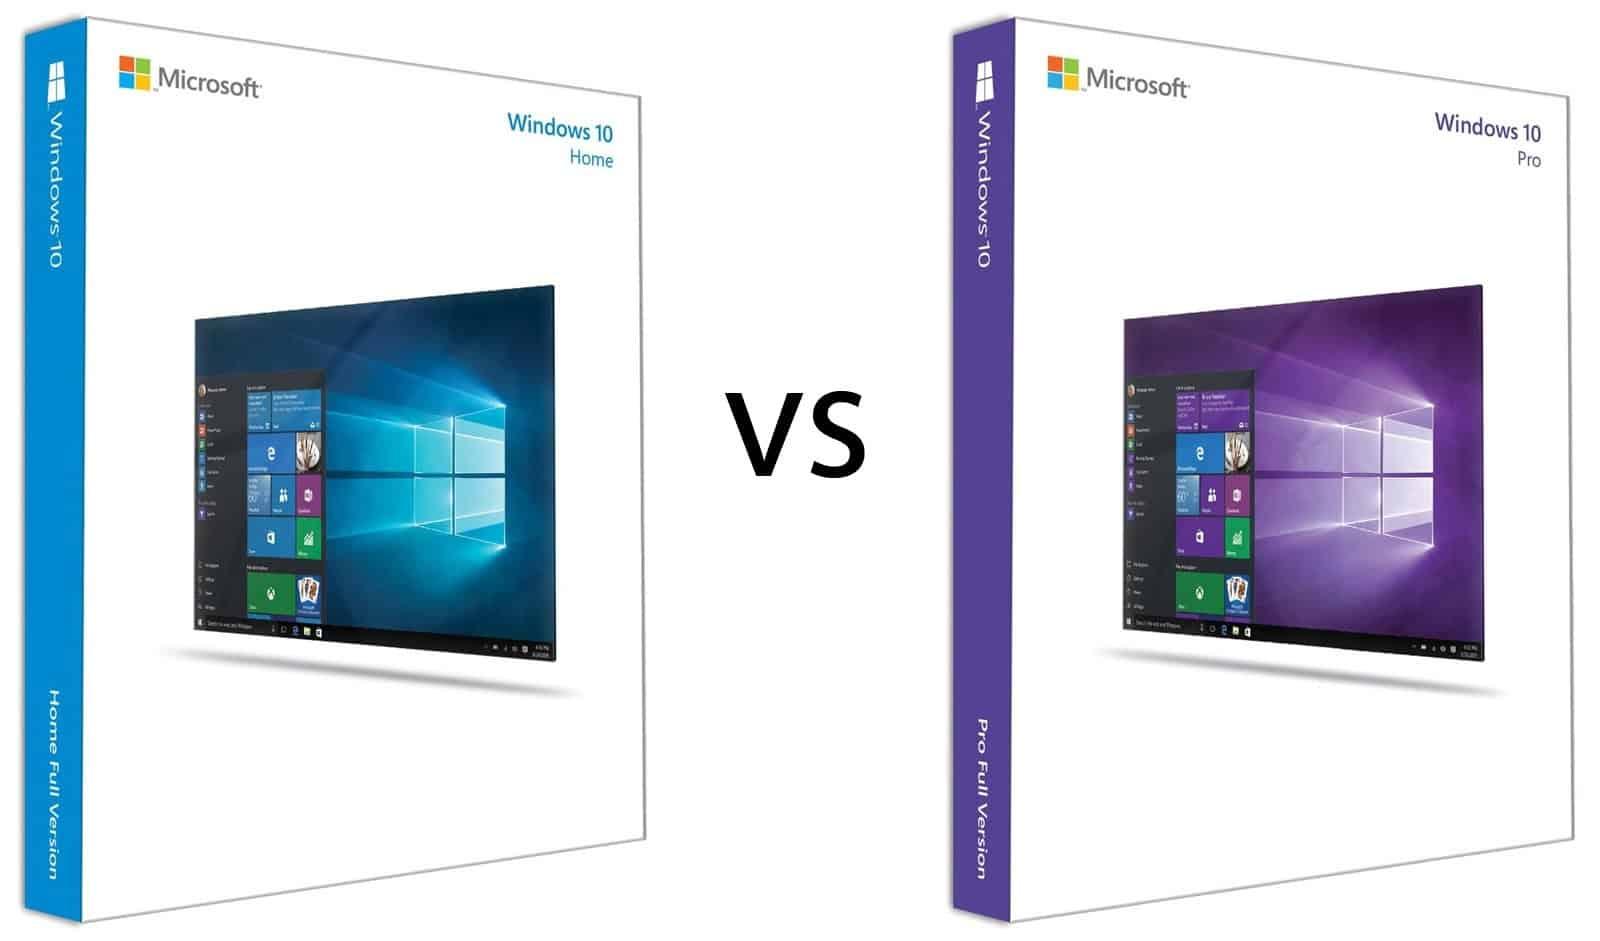 Perbedaan Windows 10 Home dengan Pro